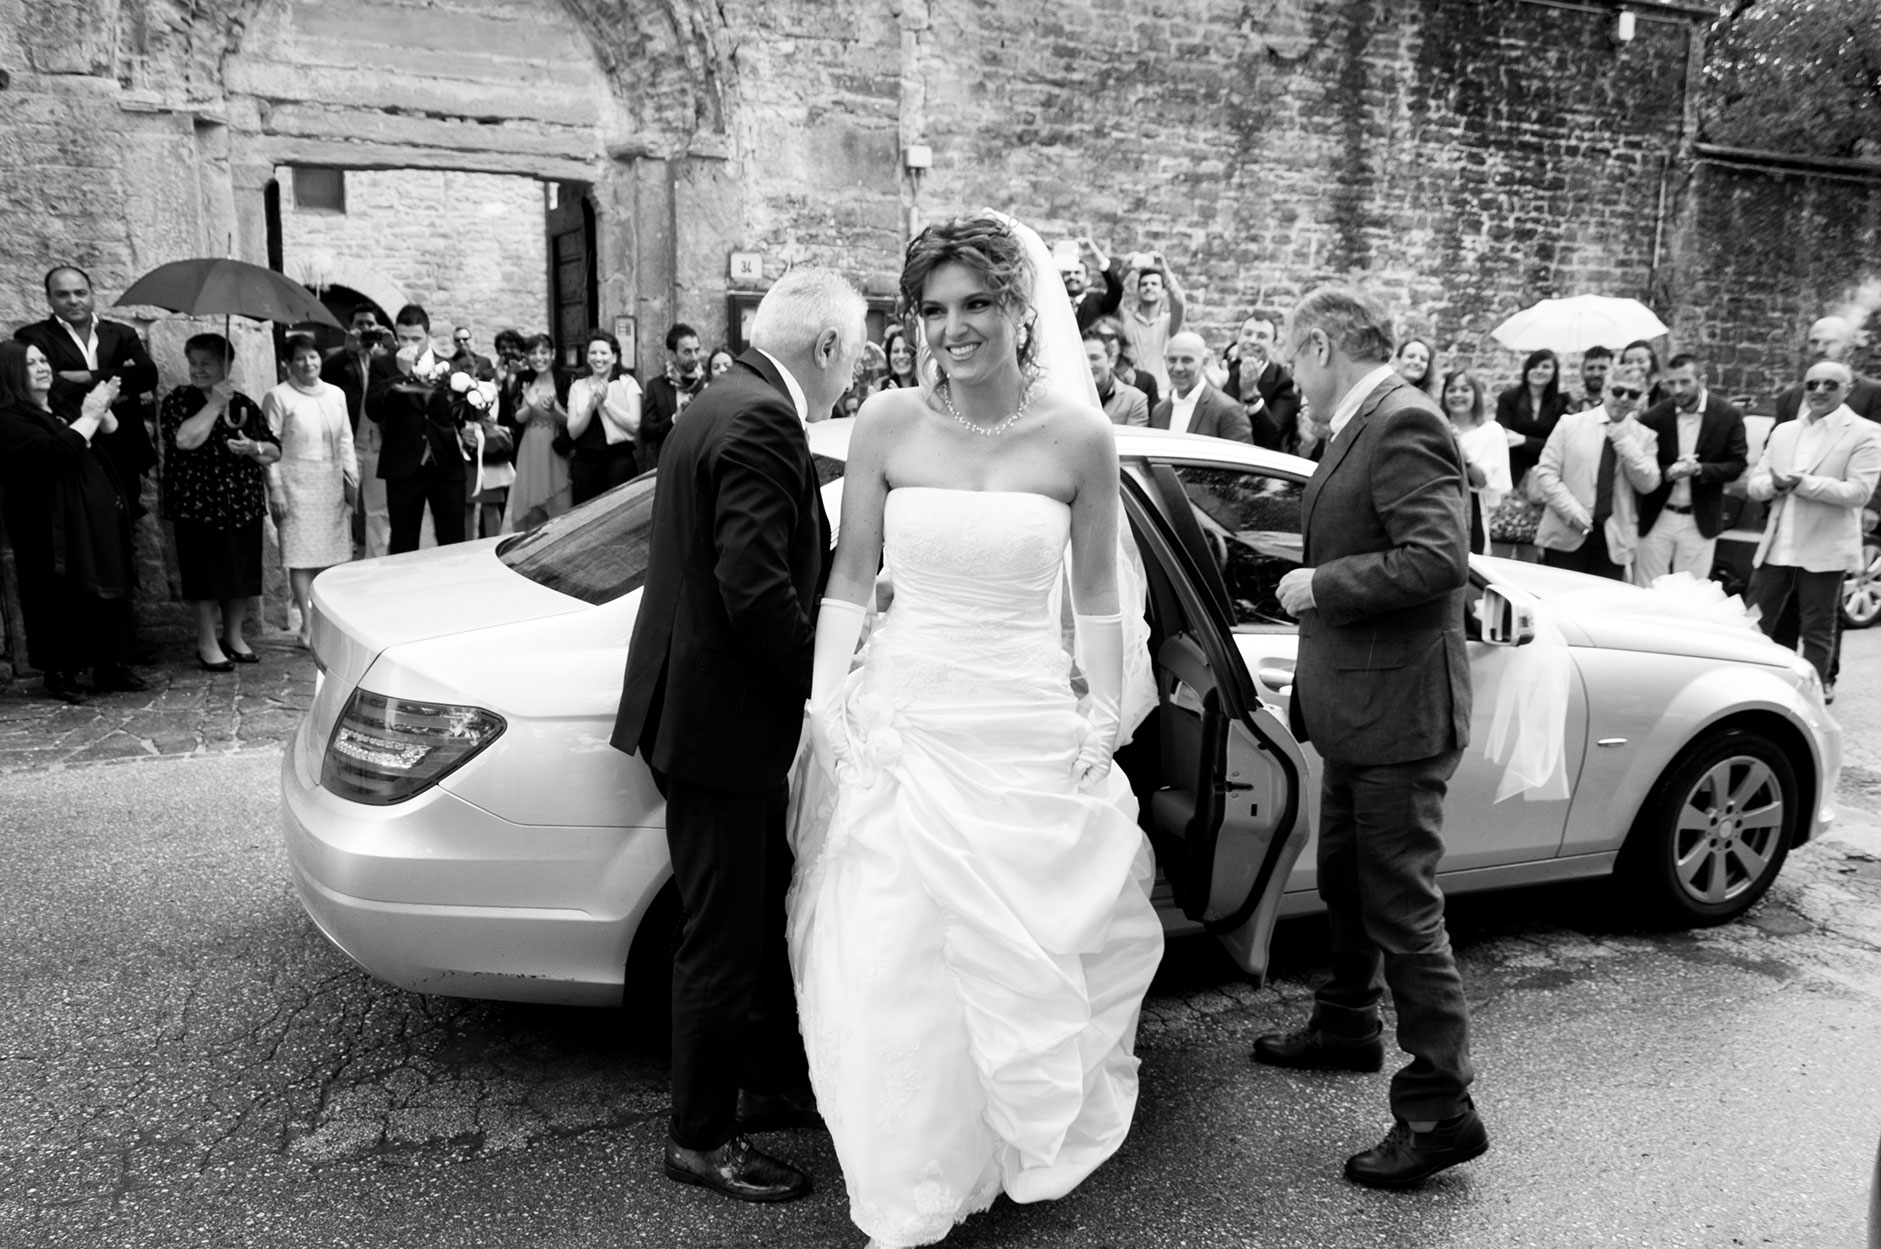 Francesca-Ferrati-wedding-photographer-Verona-Federica-Giovanni8